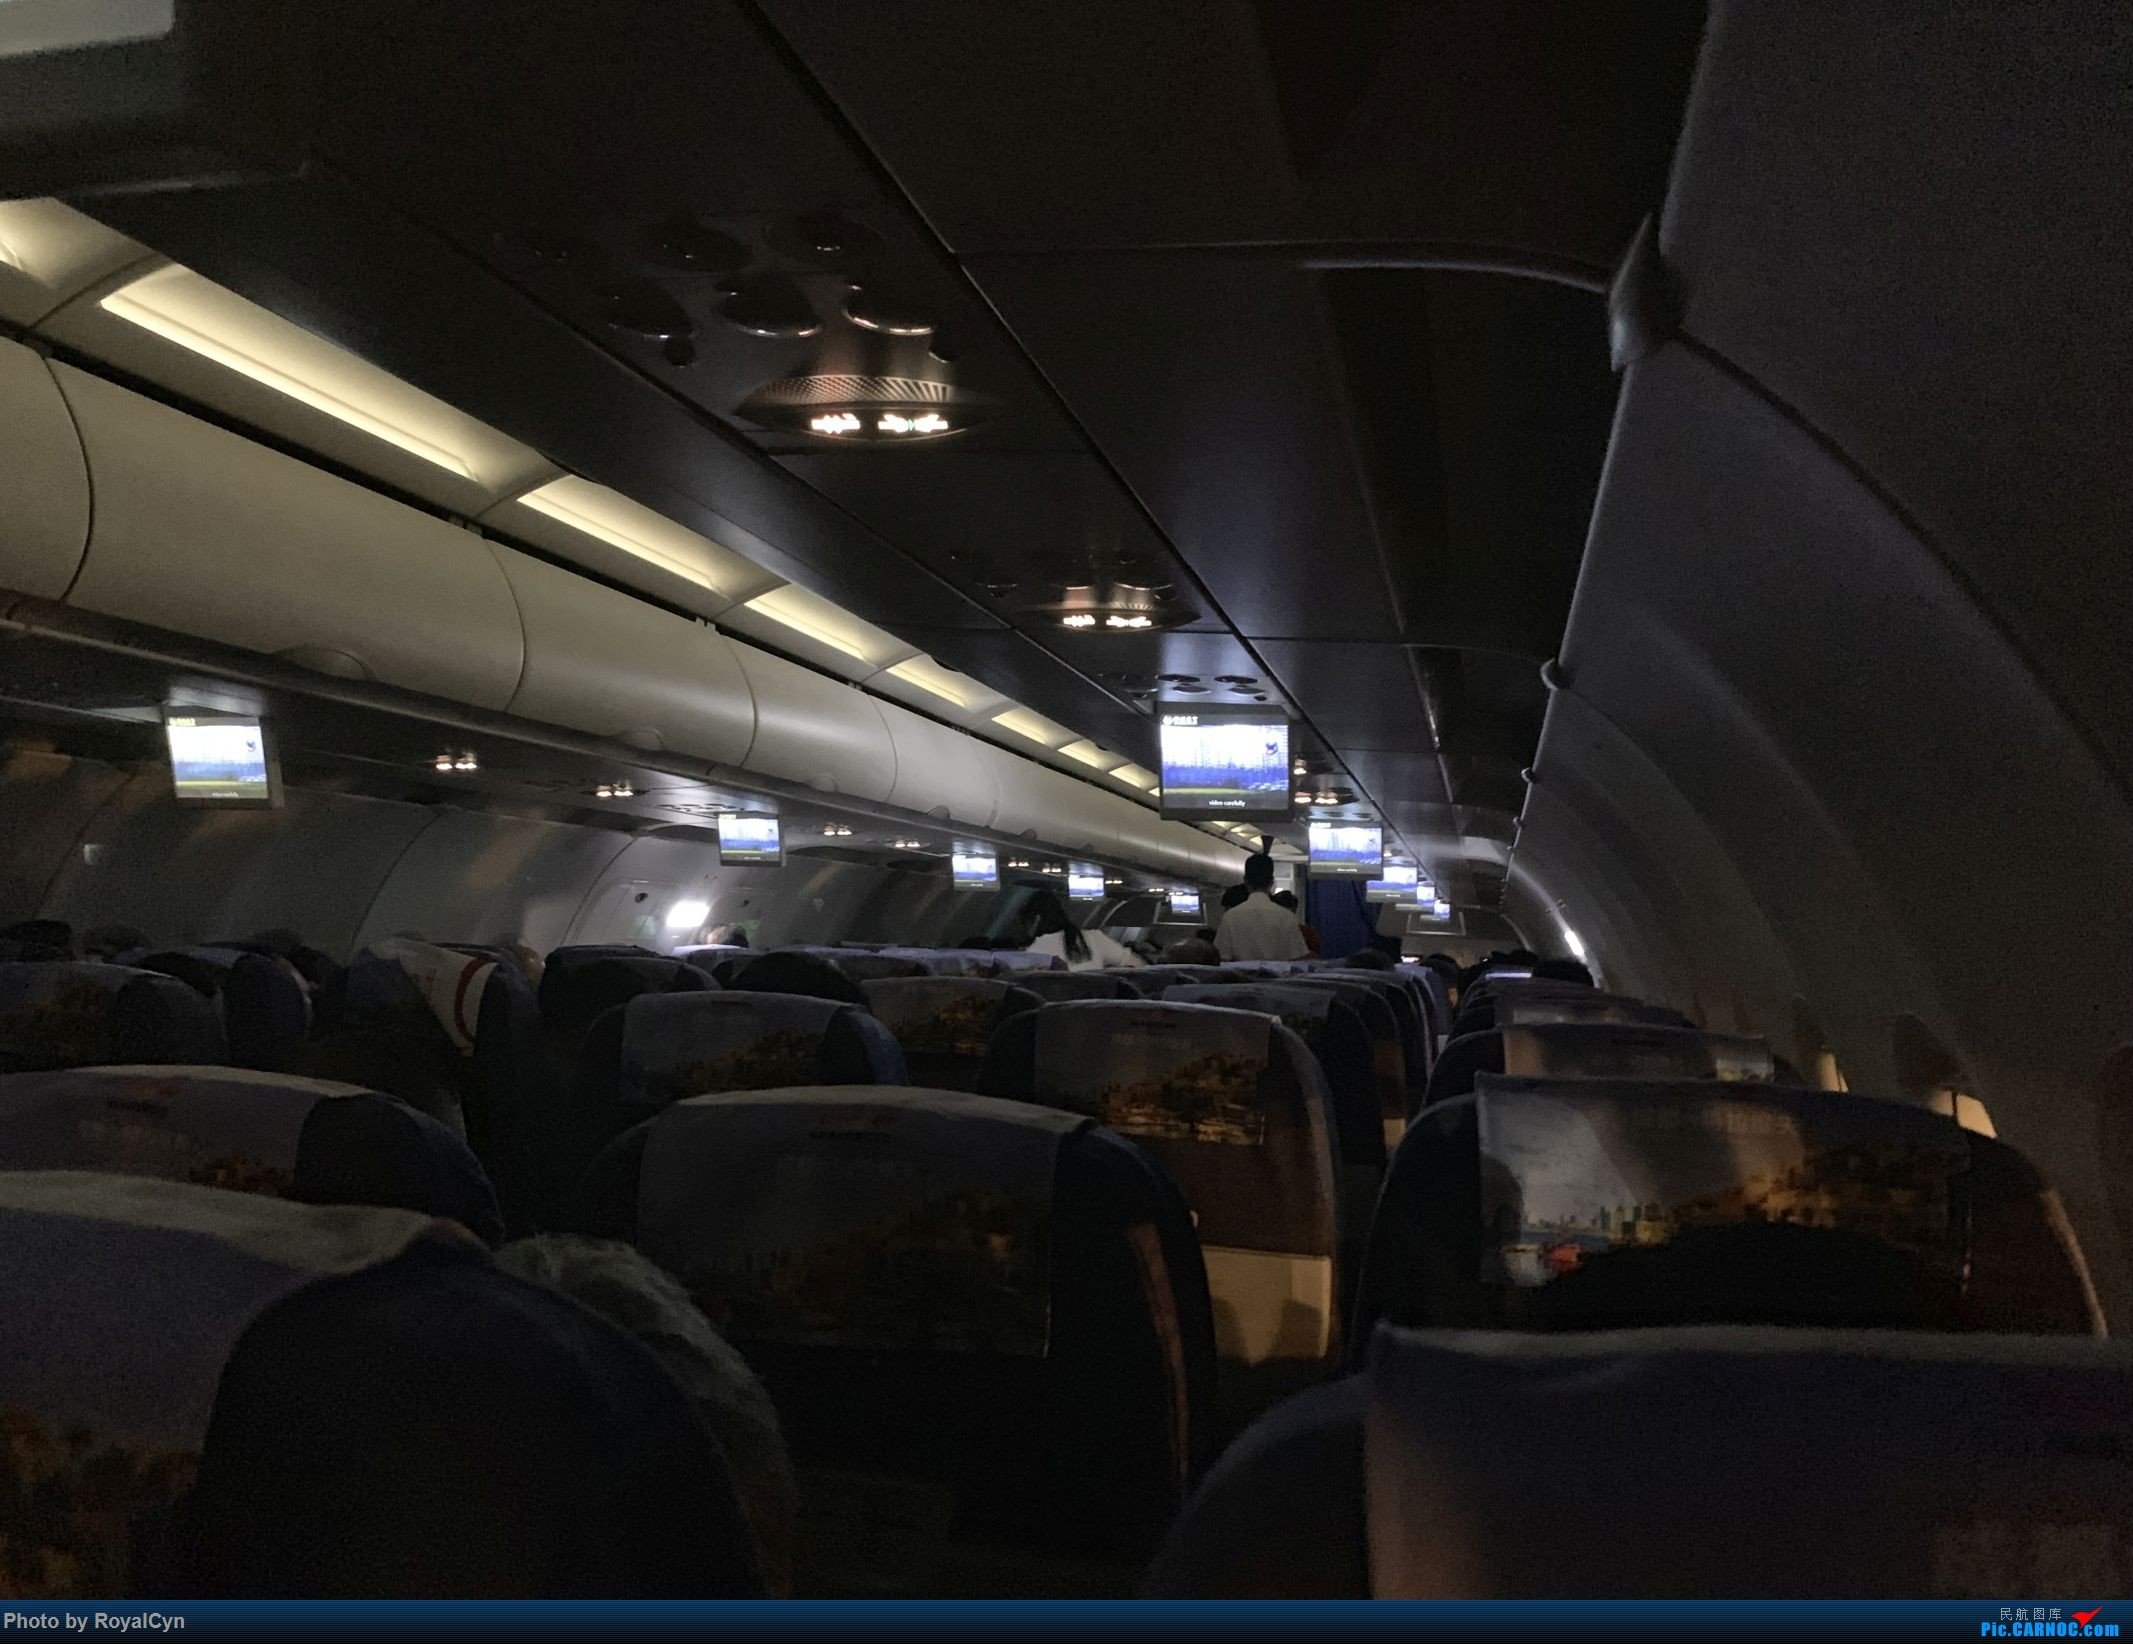 Re:[原创]Royal游记No.3【佛塔国度狂想曲——棉麻国缅甸】三城6日游 AIRBUS A320-200 B-8372 中国杭州萧山国际机场